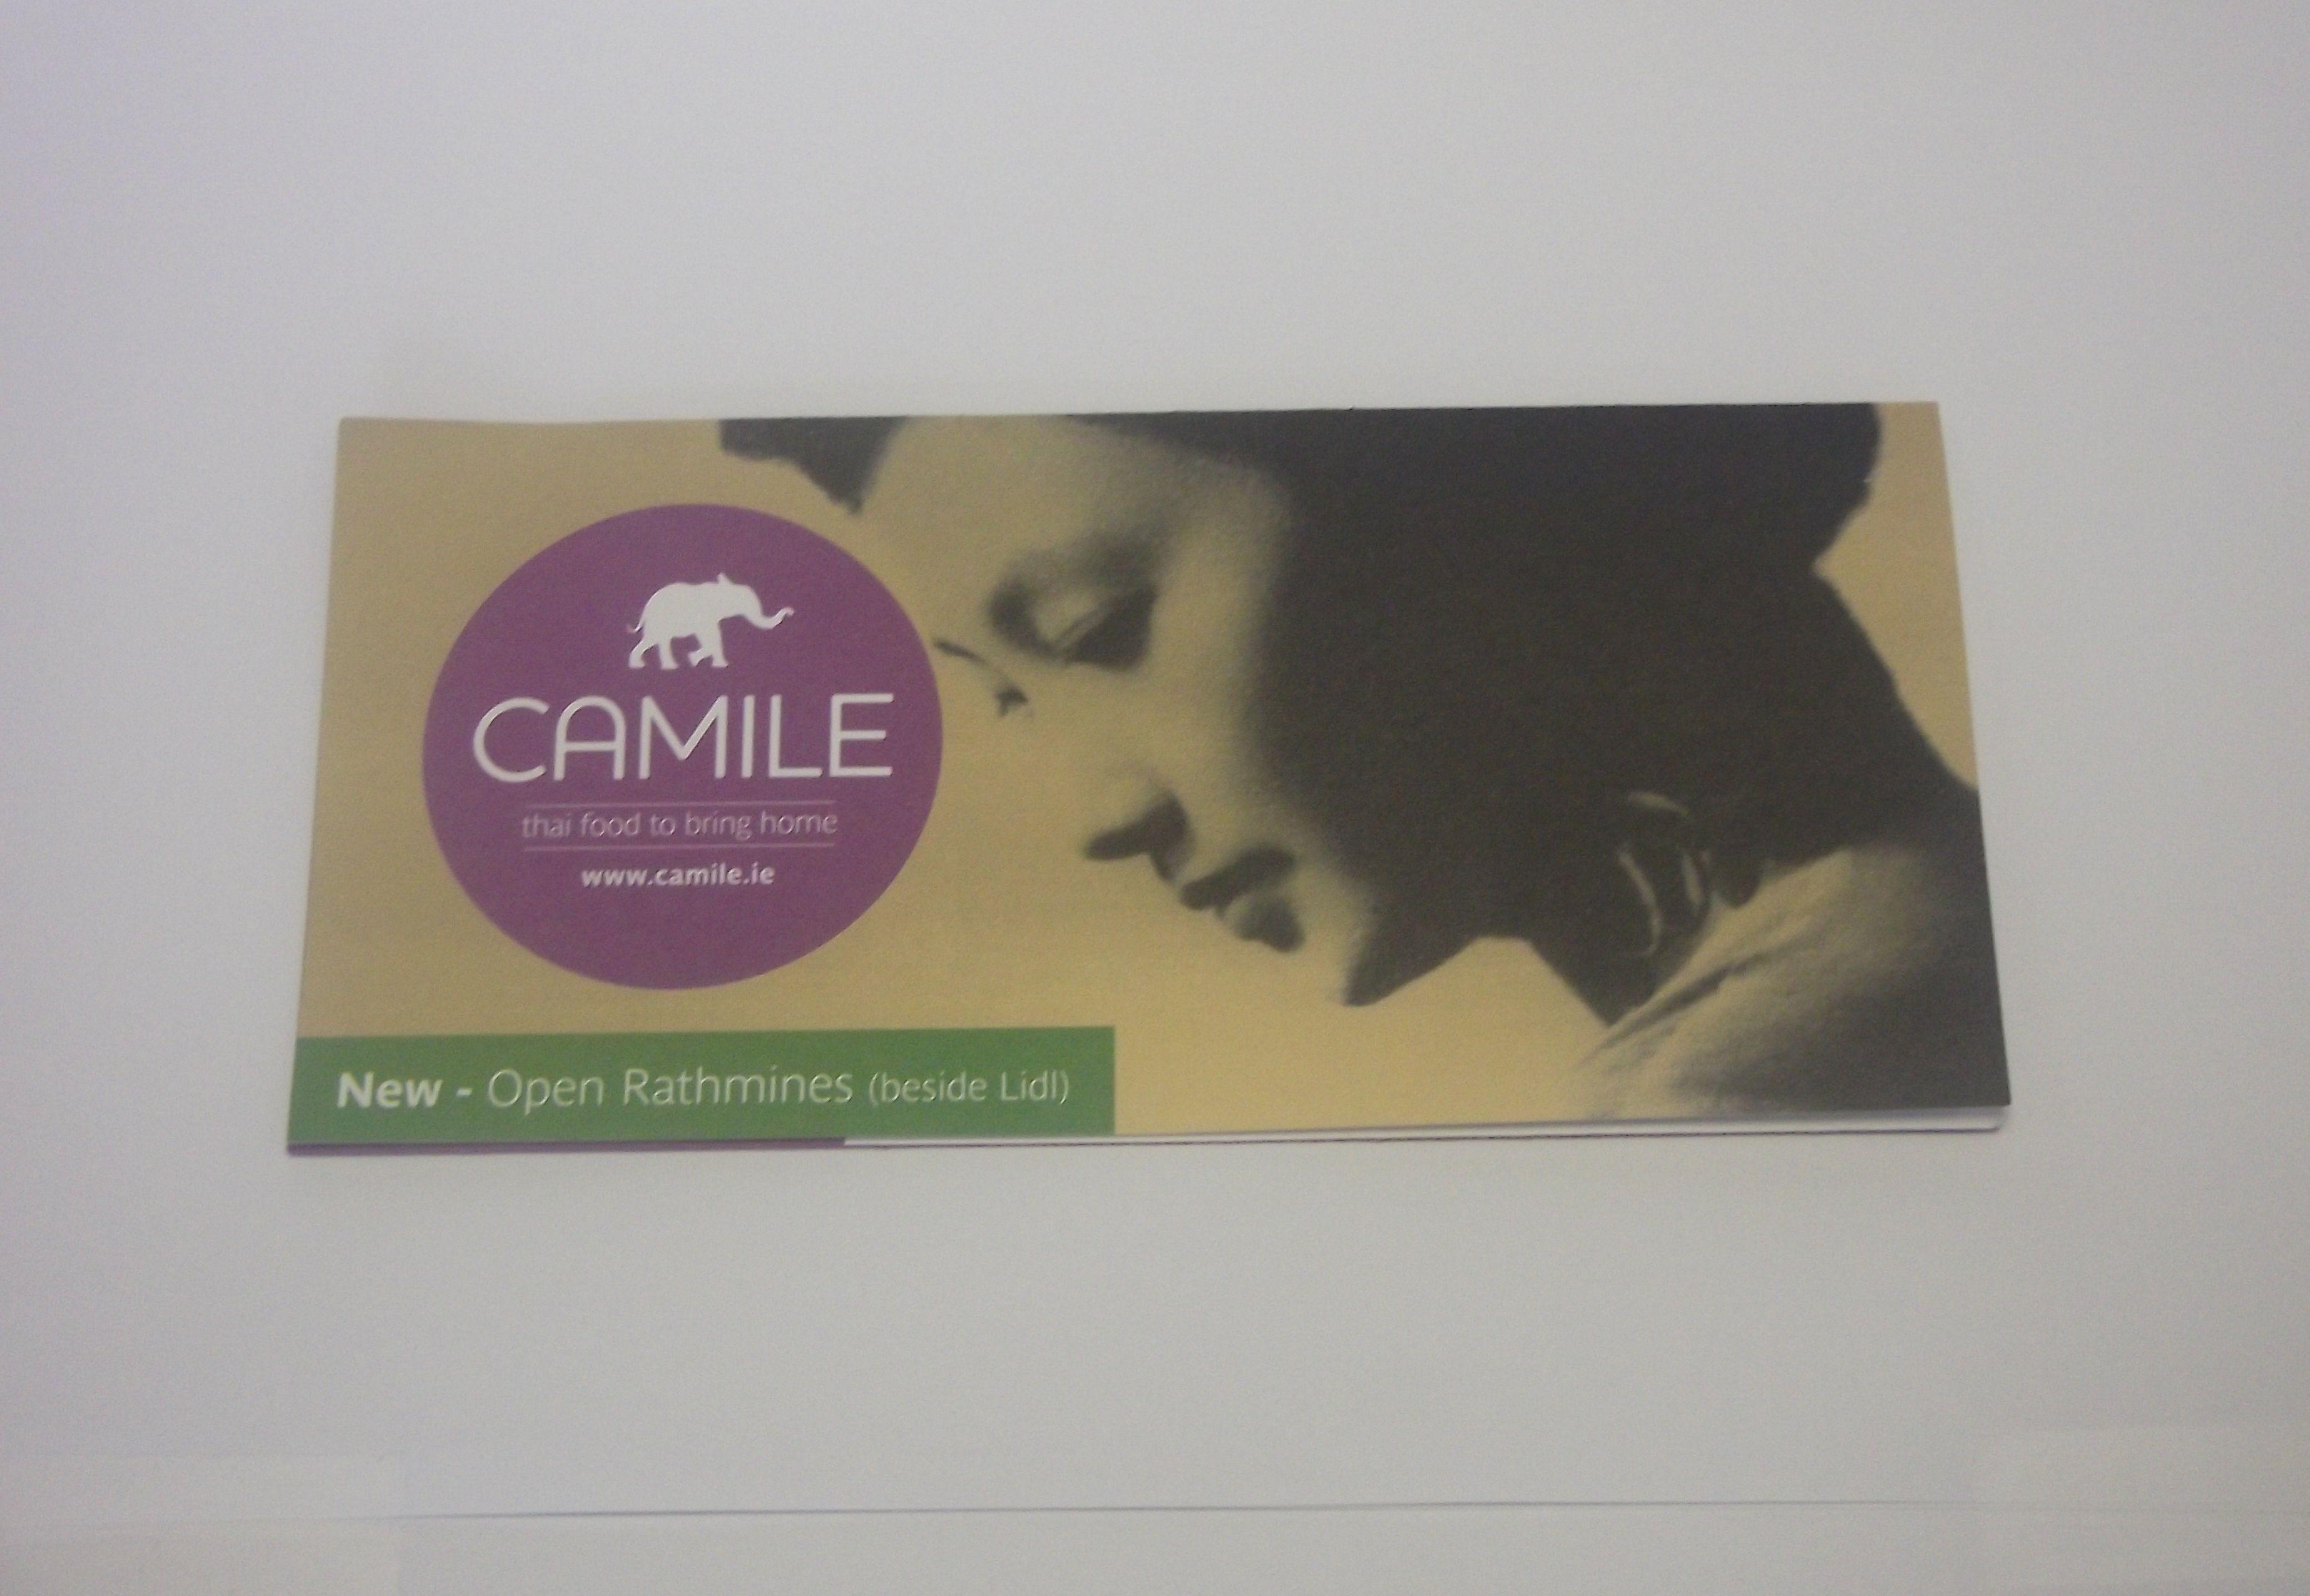 Menu produced for Camile Thai